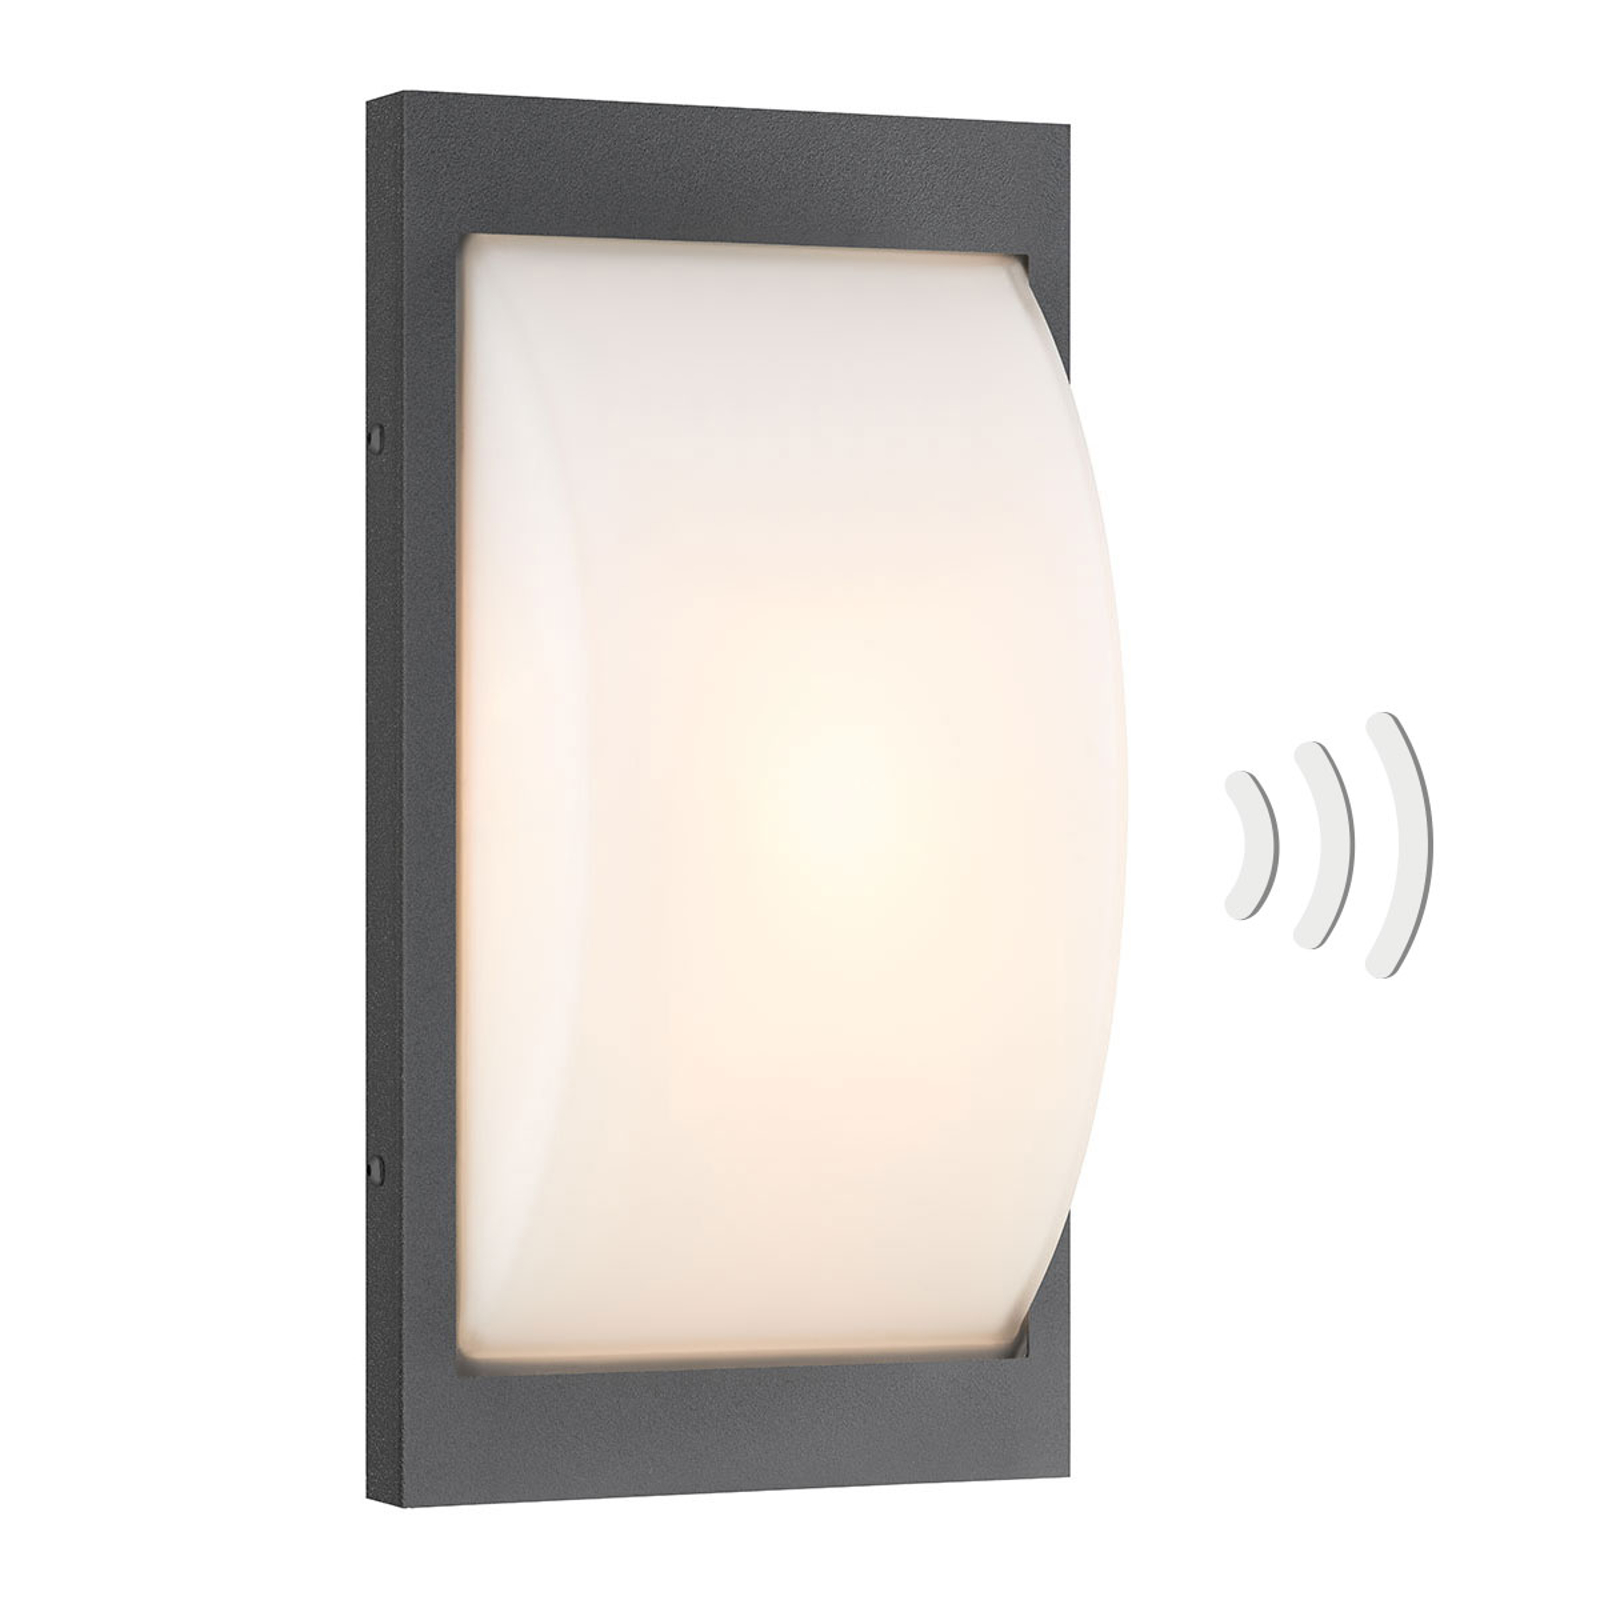 Sensor-buitenwandlamp 069SEN E27 grafiet